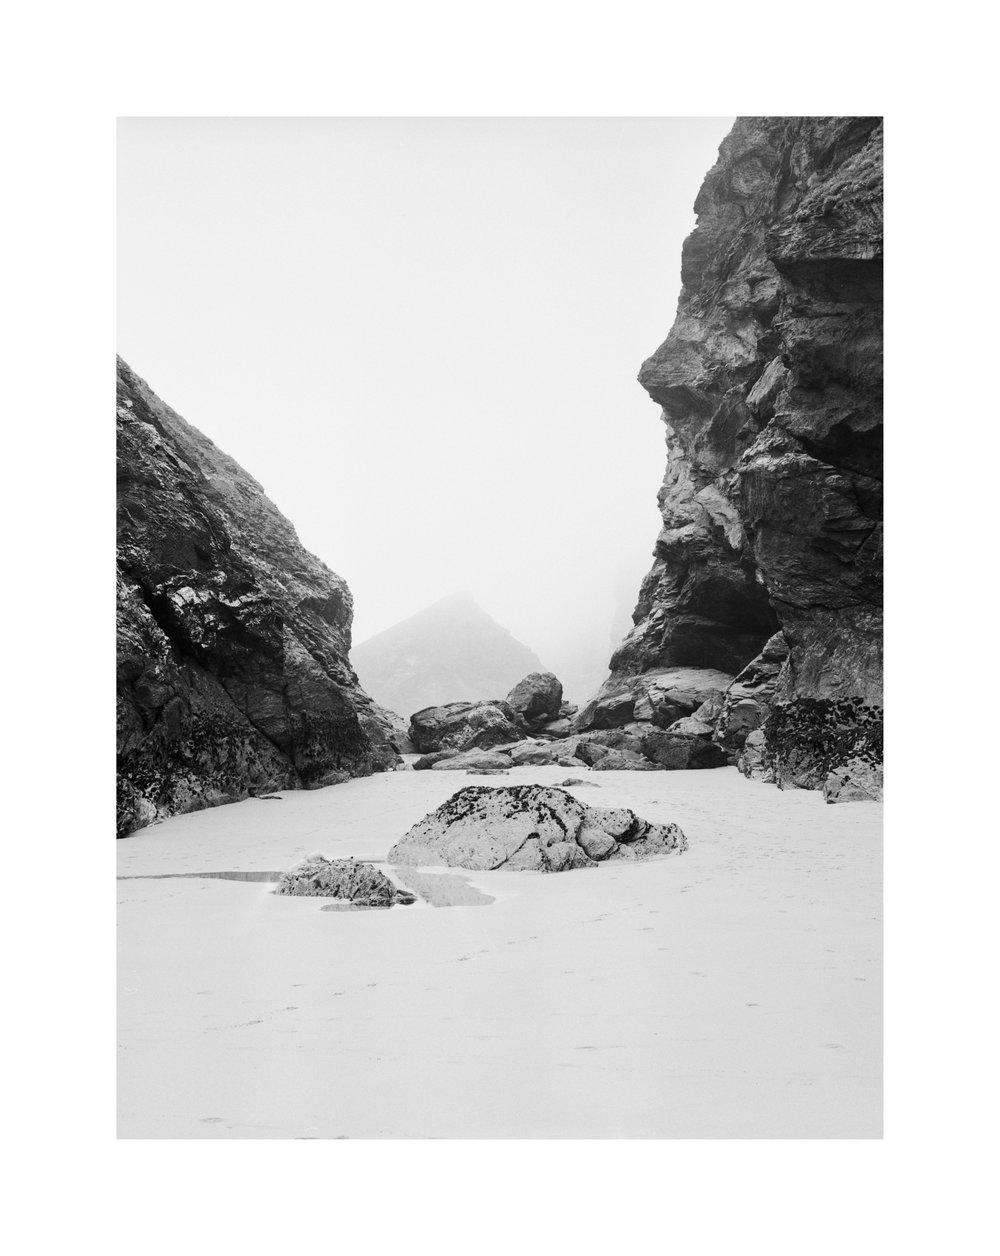 cliffs2 copy.jpg